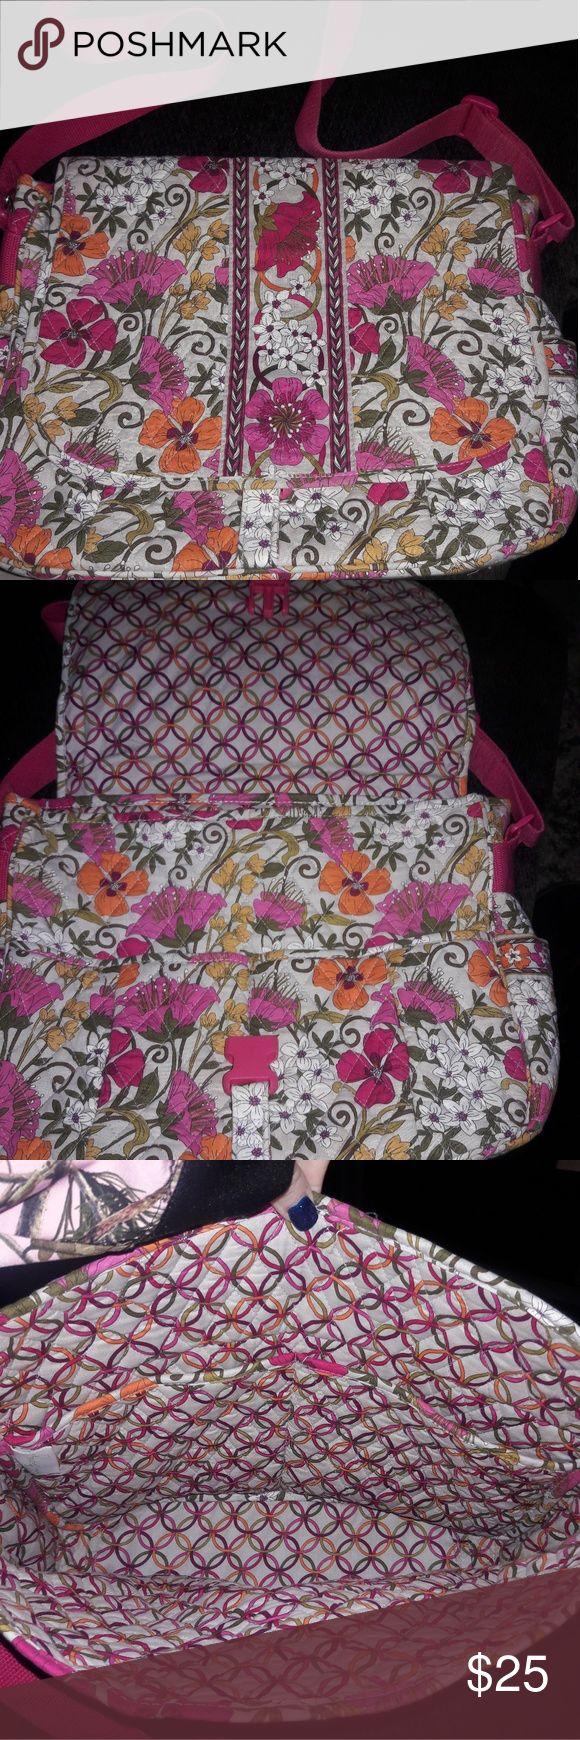 Vera Bradley laptop bag, large shoulder strap Perfect for school work etc excellent shape and a super cute pattern. Vera Bradley Bags Laptop Bags